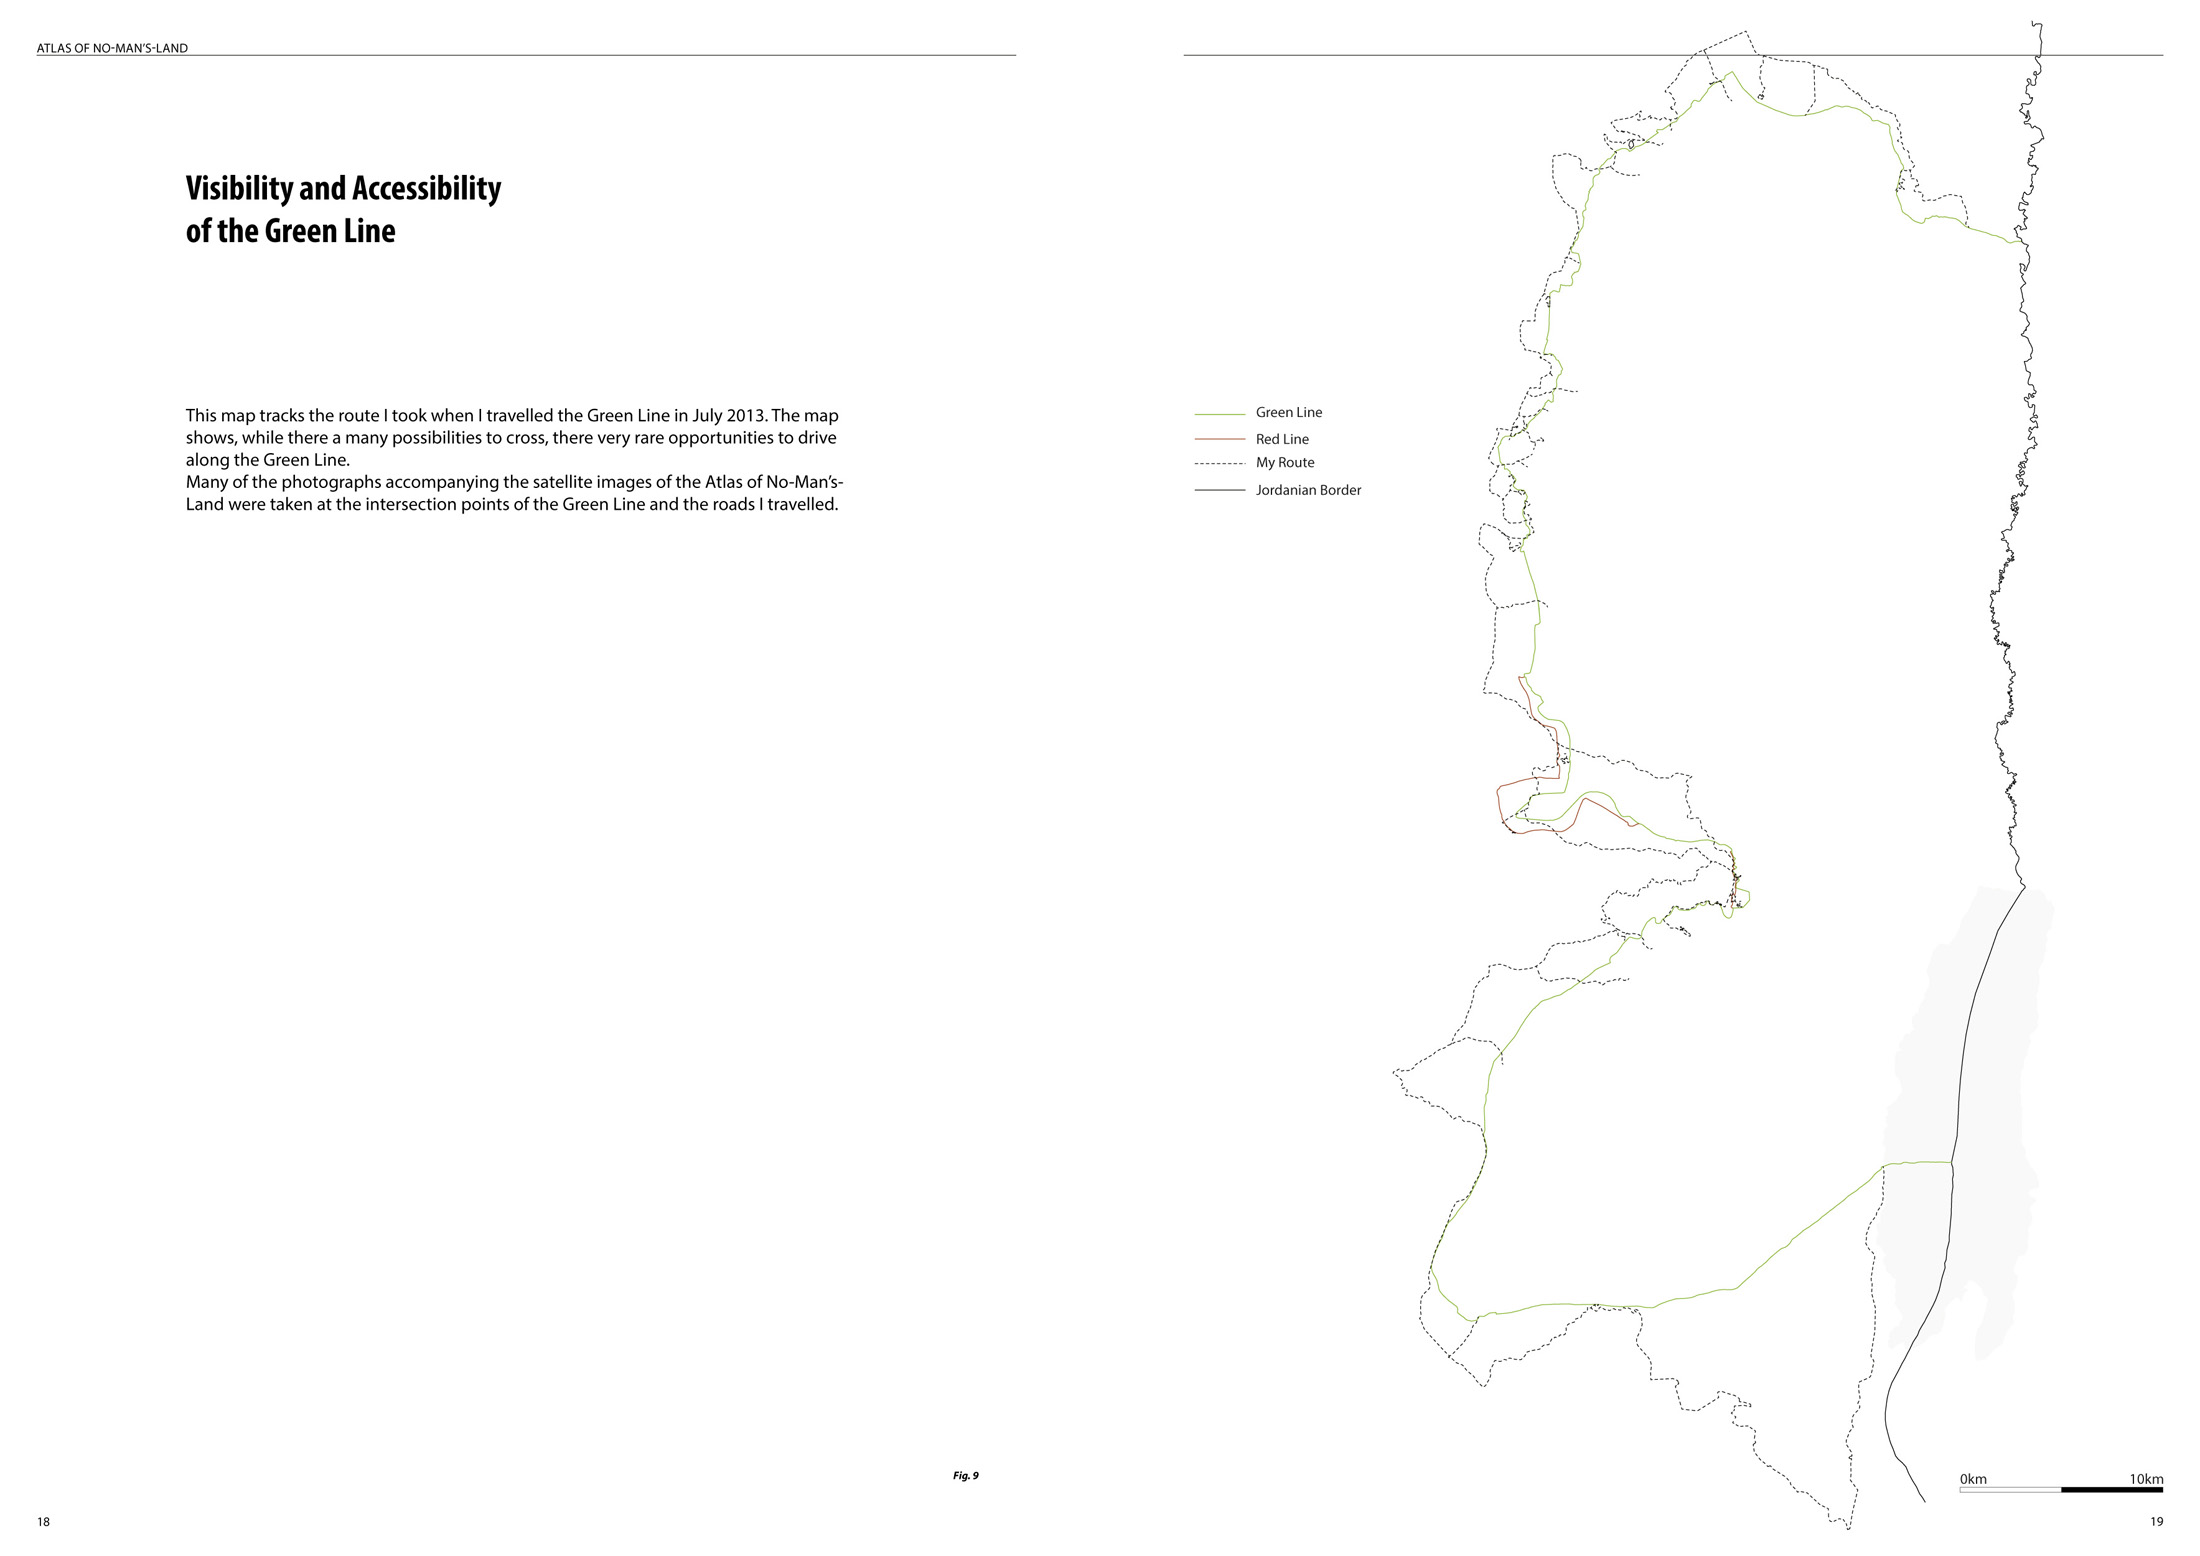 Theuer Orit - Atlas of NoMan'sLand Spreads-10